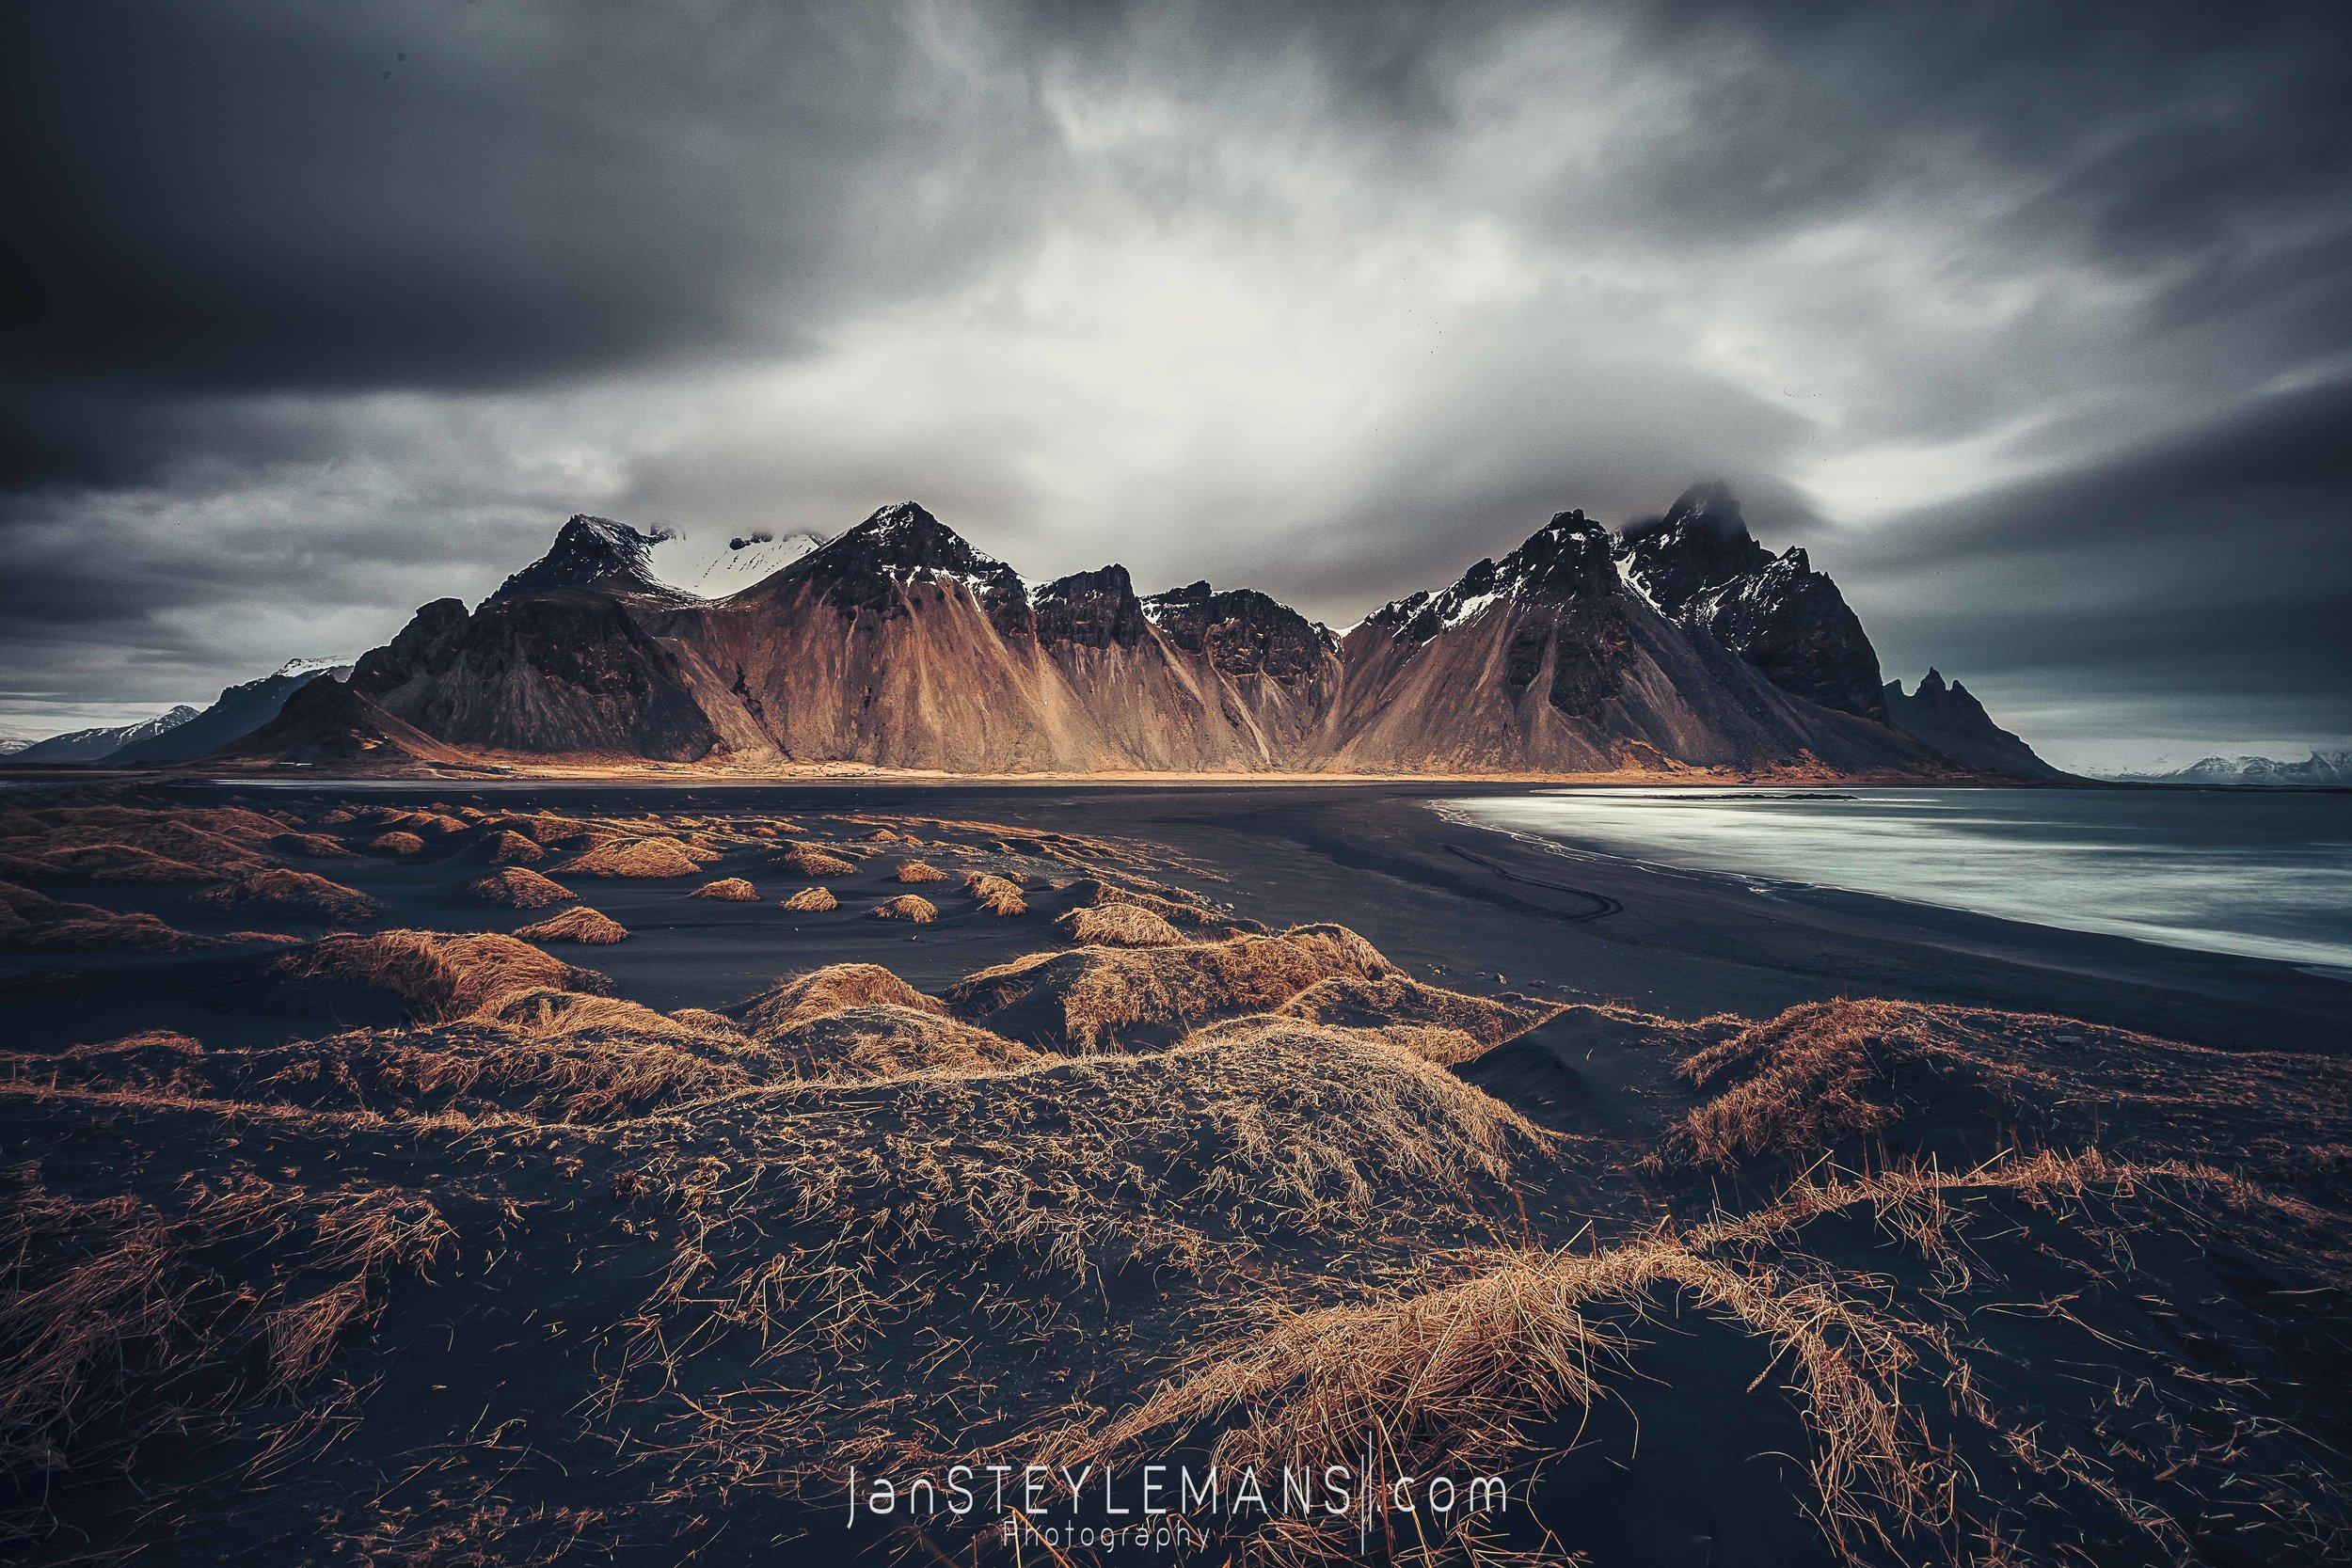 52. Stoksness, Iceland